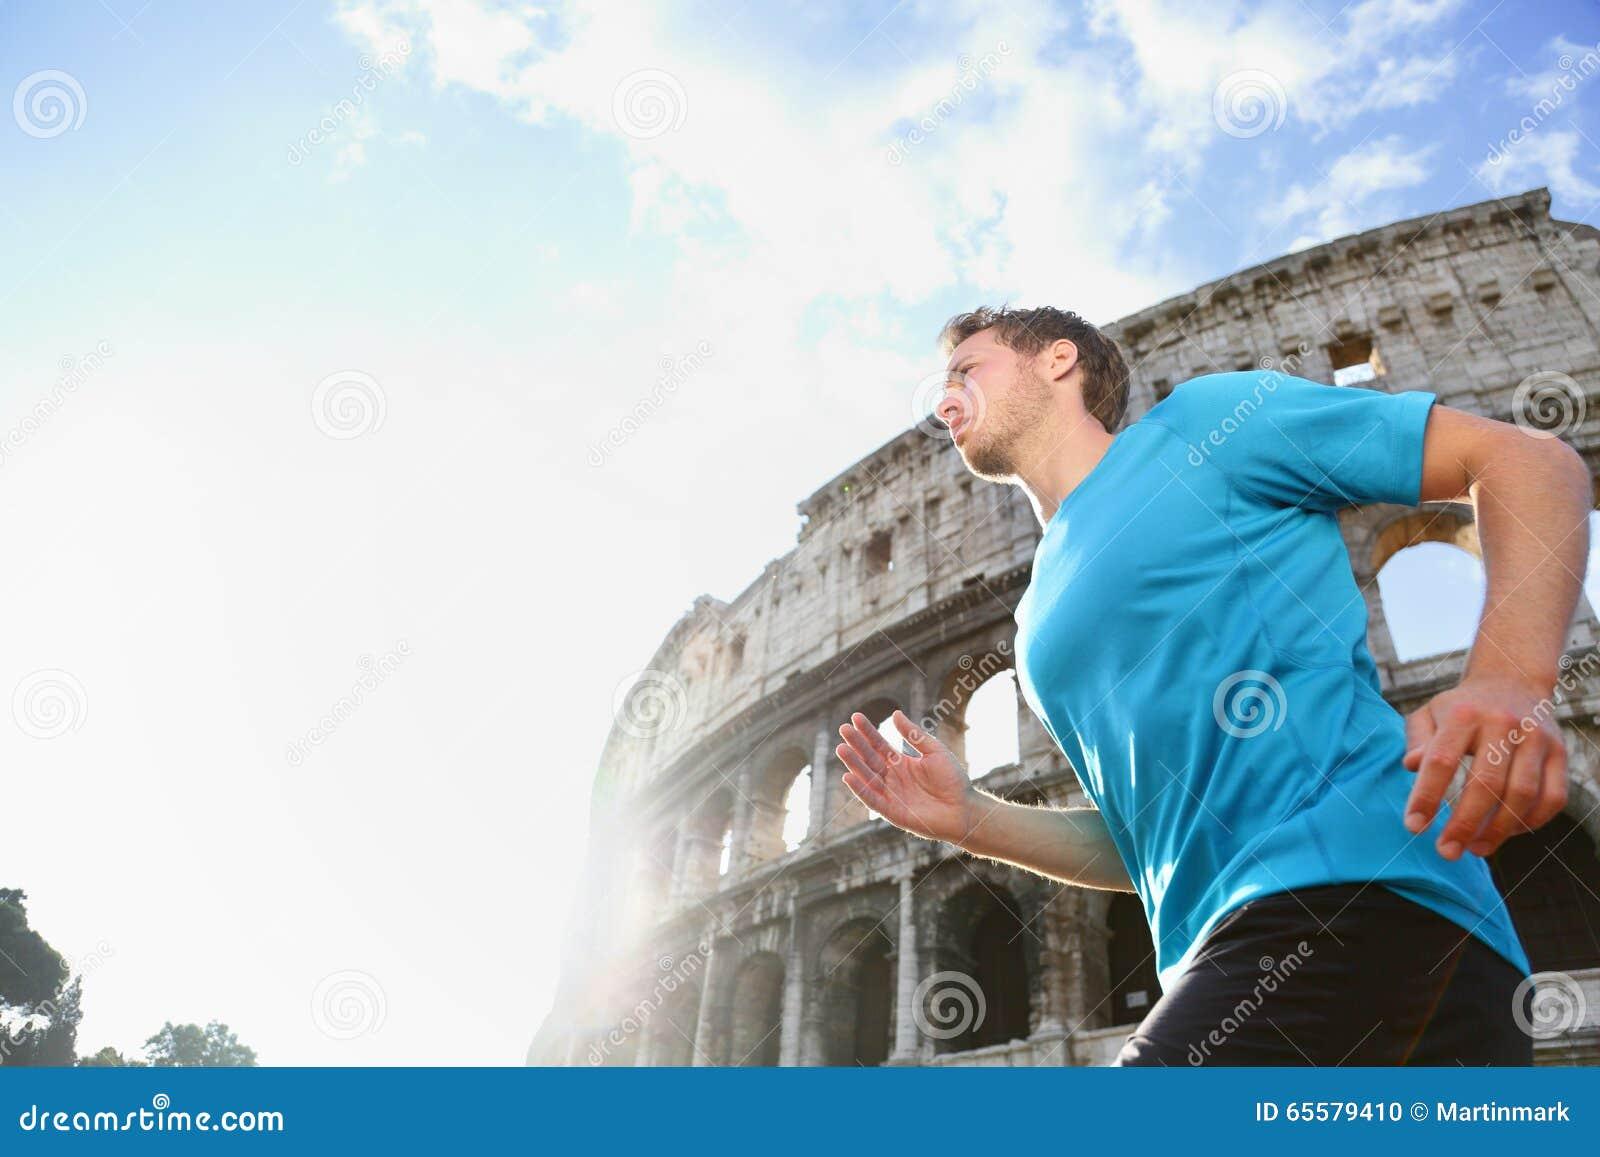 Runner Jogging and Running Against Colosseum